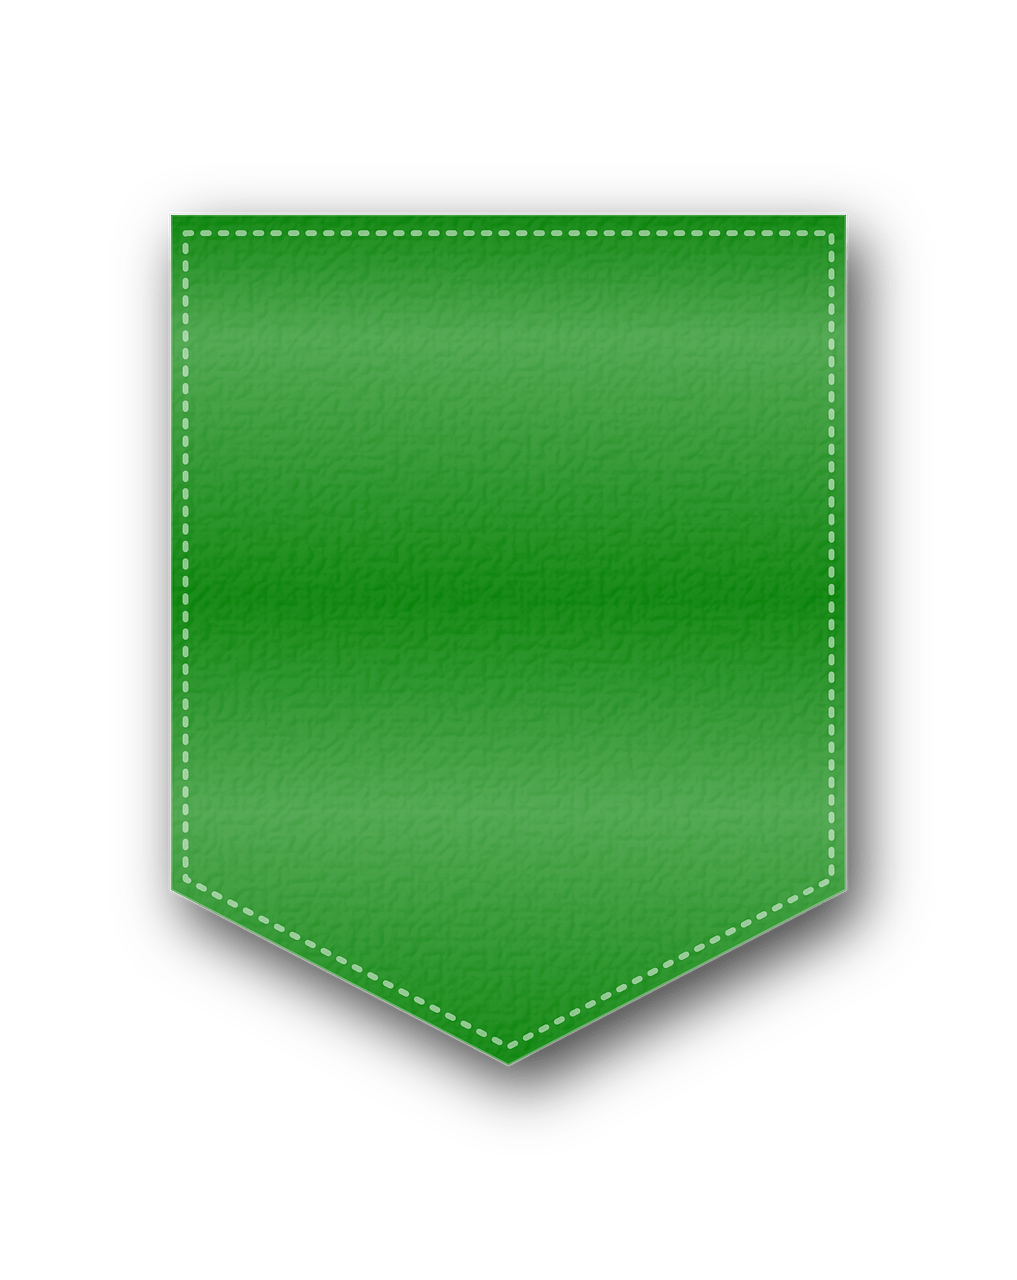 Pita Hijau Png : hijau, Badge, Decoration, Ribbon, Vector, Graphic, Pixabay